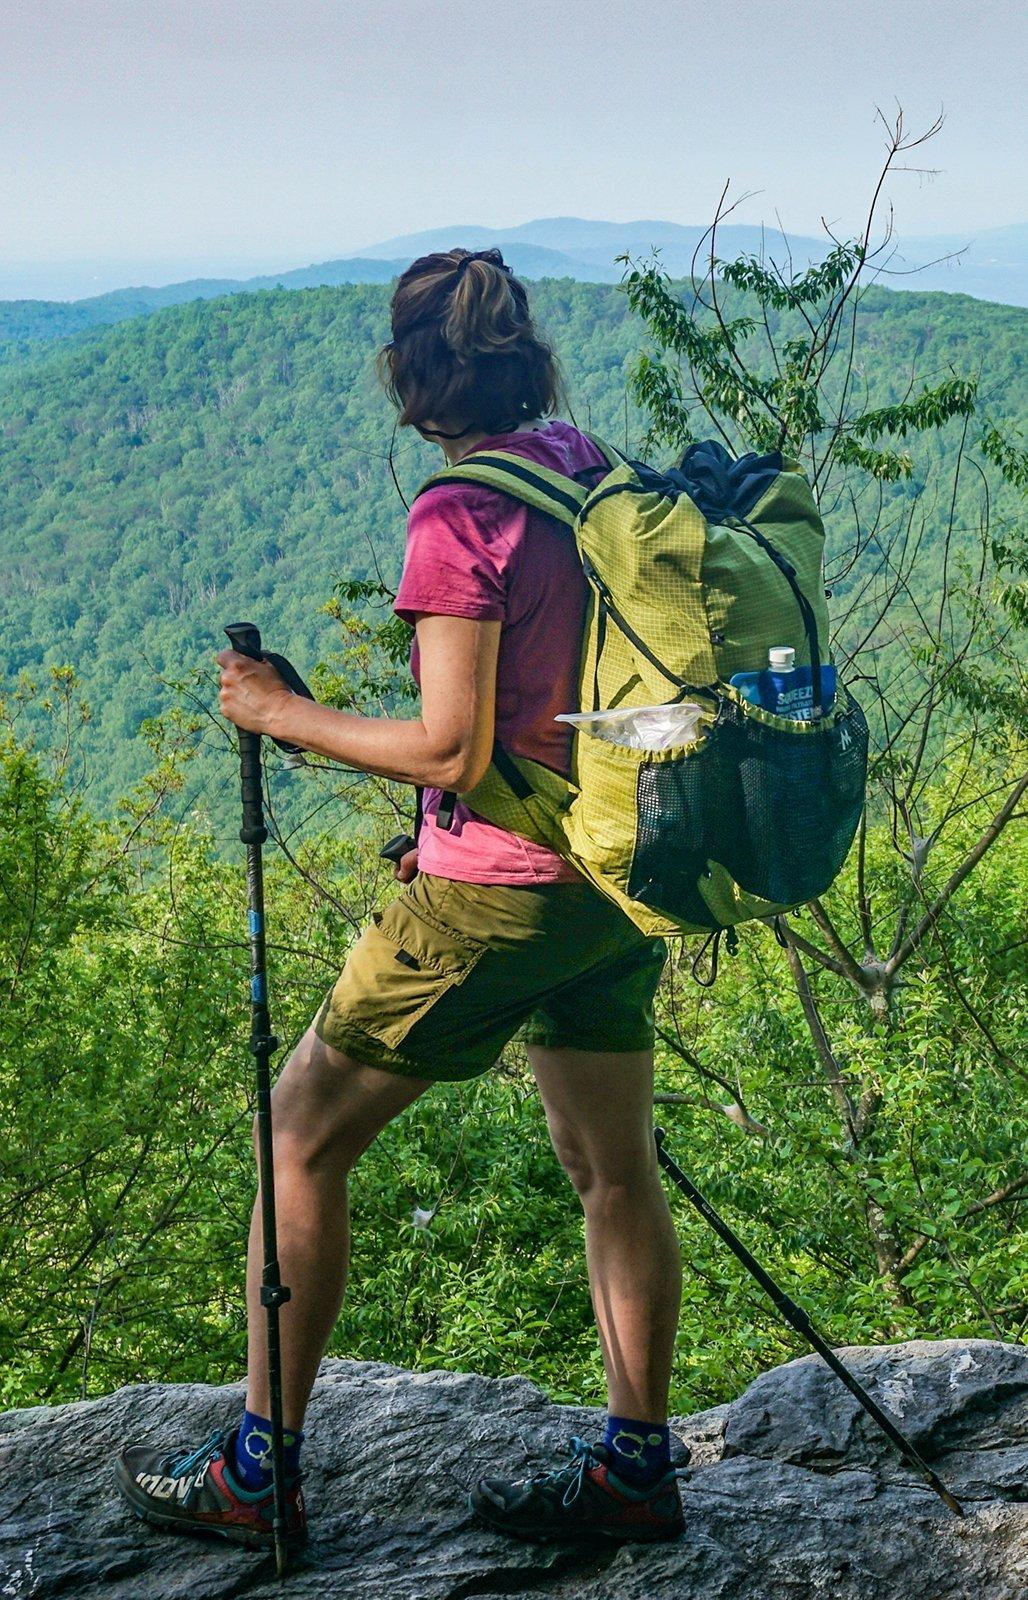 Appalachian Trail scenic overlook